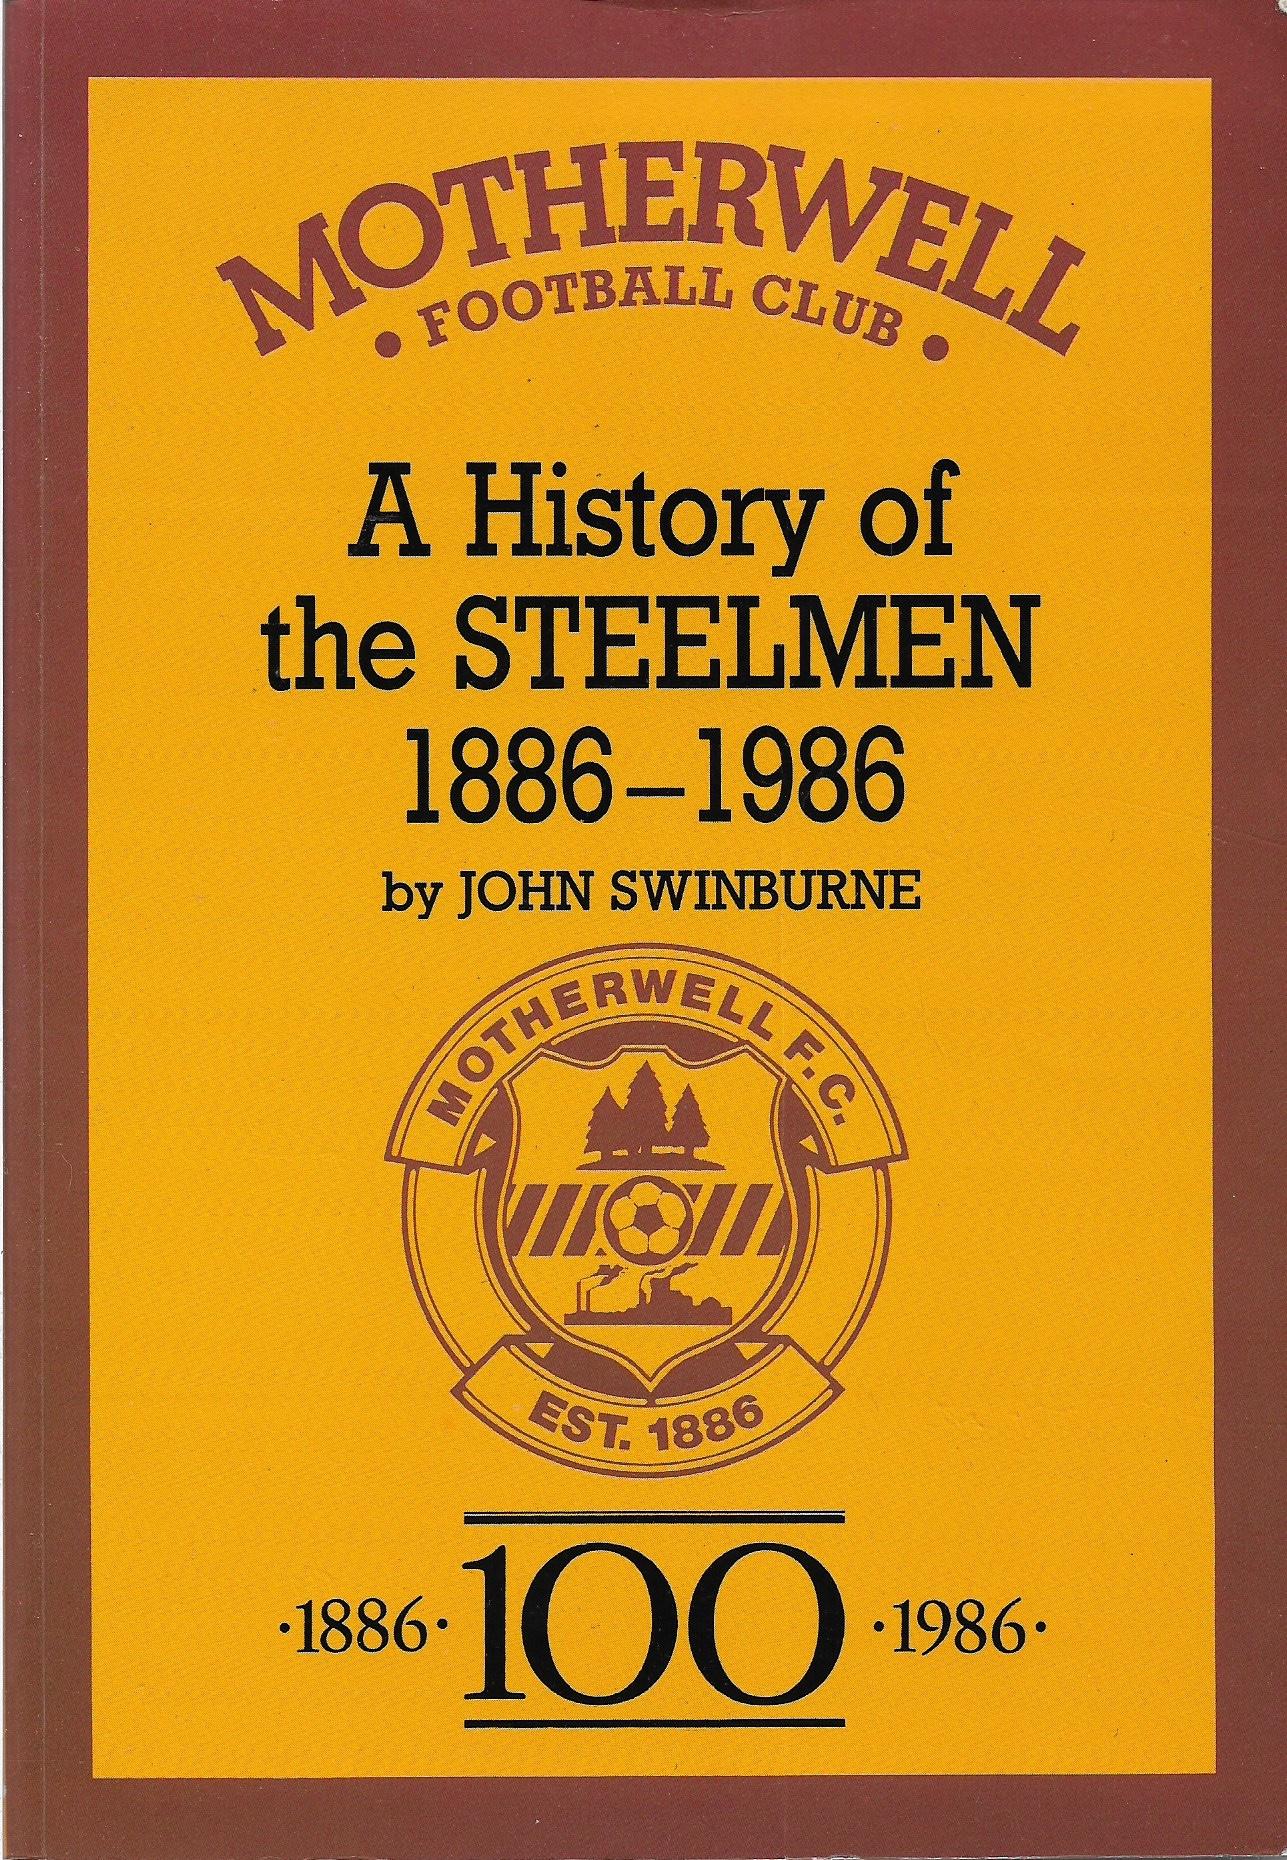 A History of the Steelmen 1886-1986